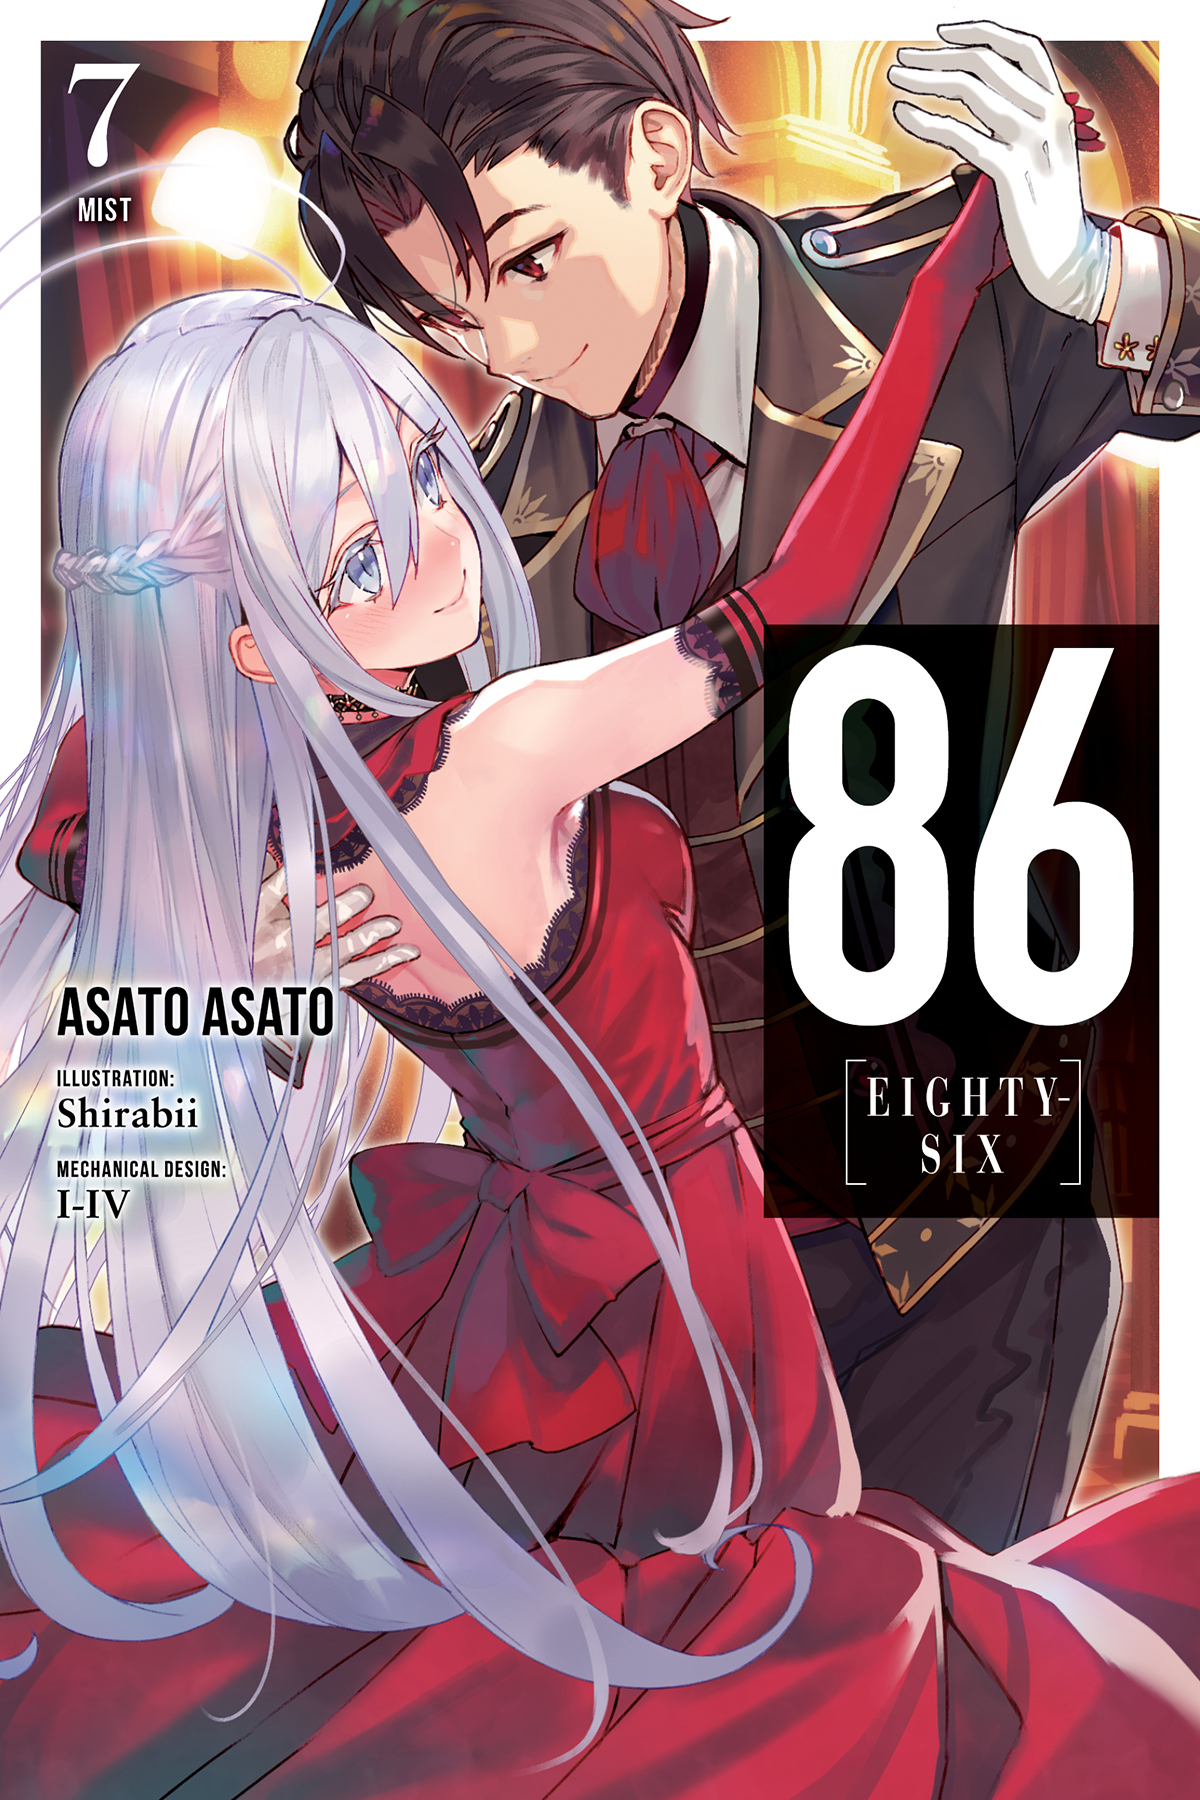 Download 86 Eighty Six Vol 7 Light Novel Epub Pdf